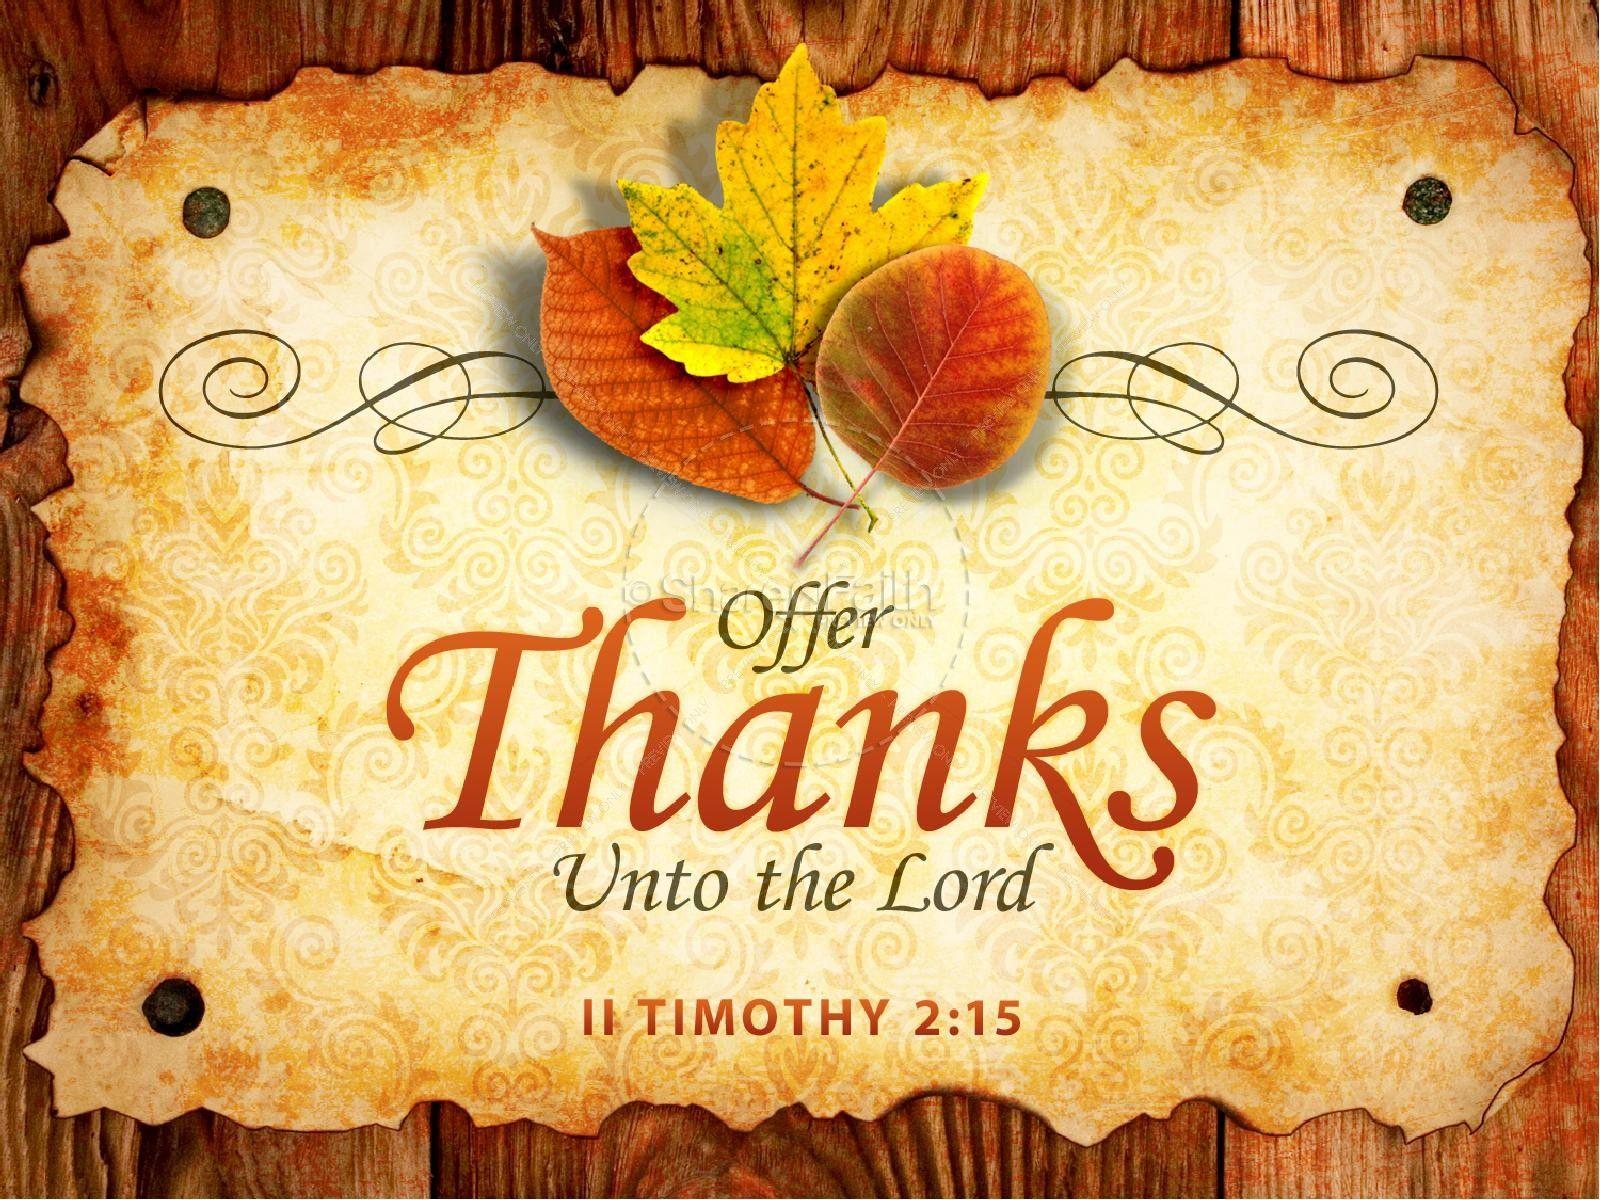 Religious Thanksgiving Wallpapers   Top Religious 1600x1200